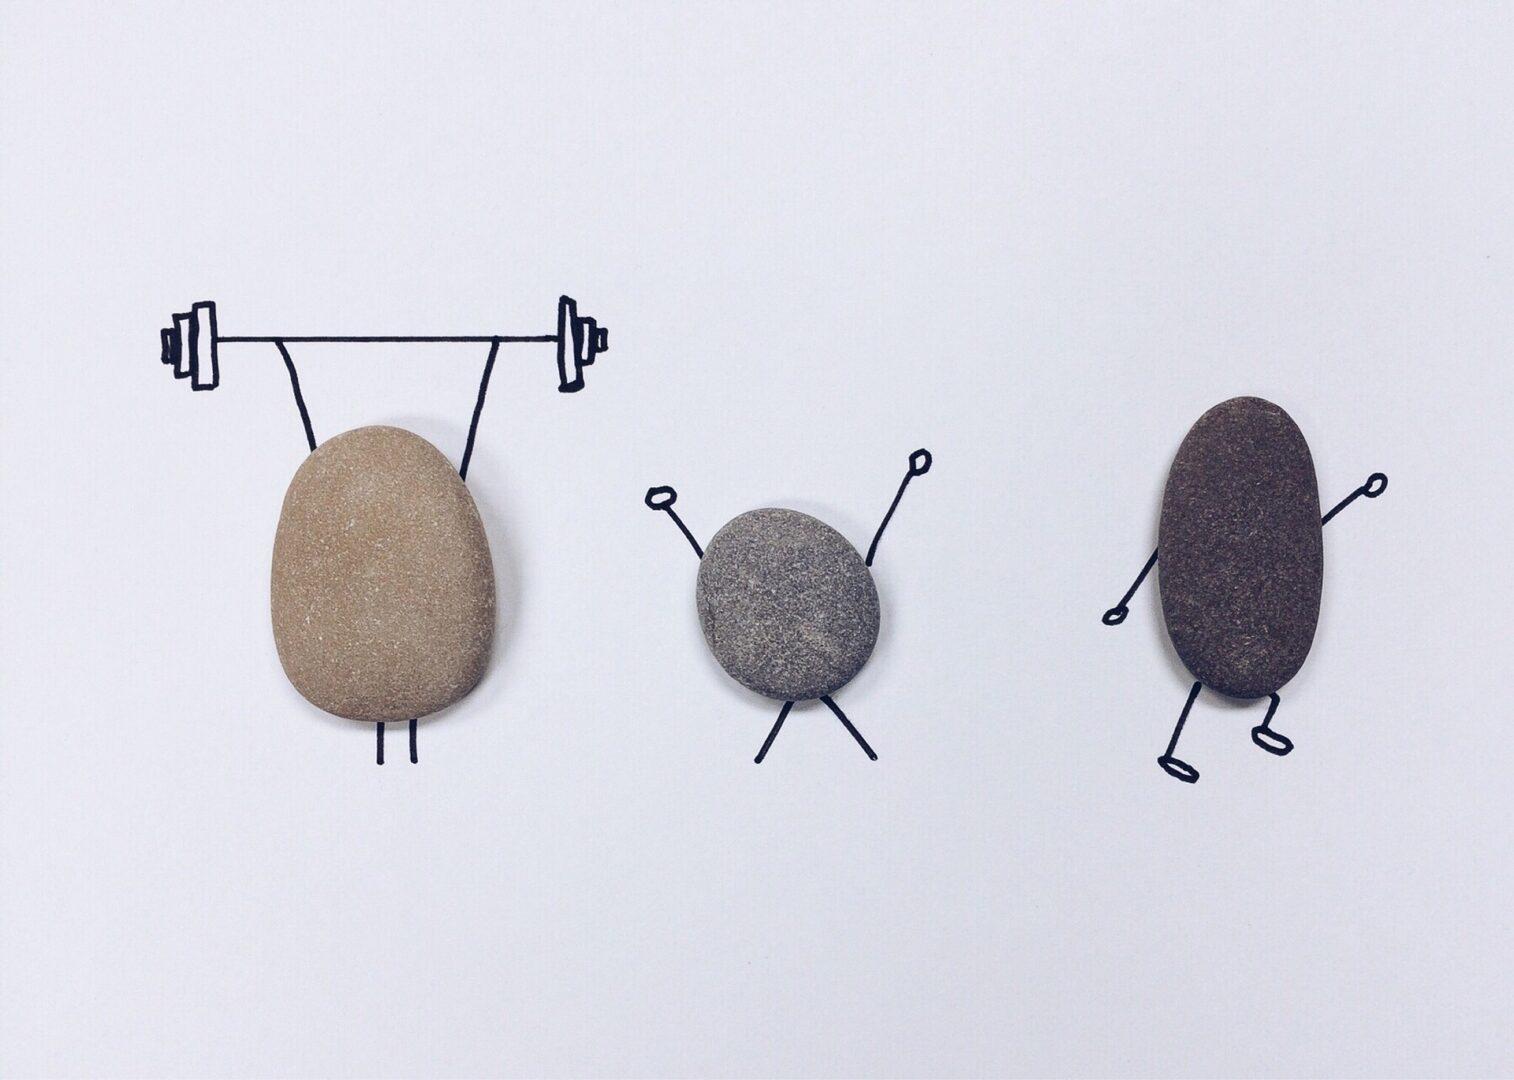 rocks lifting weights